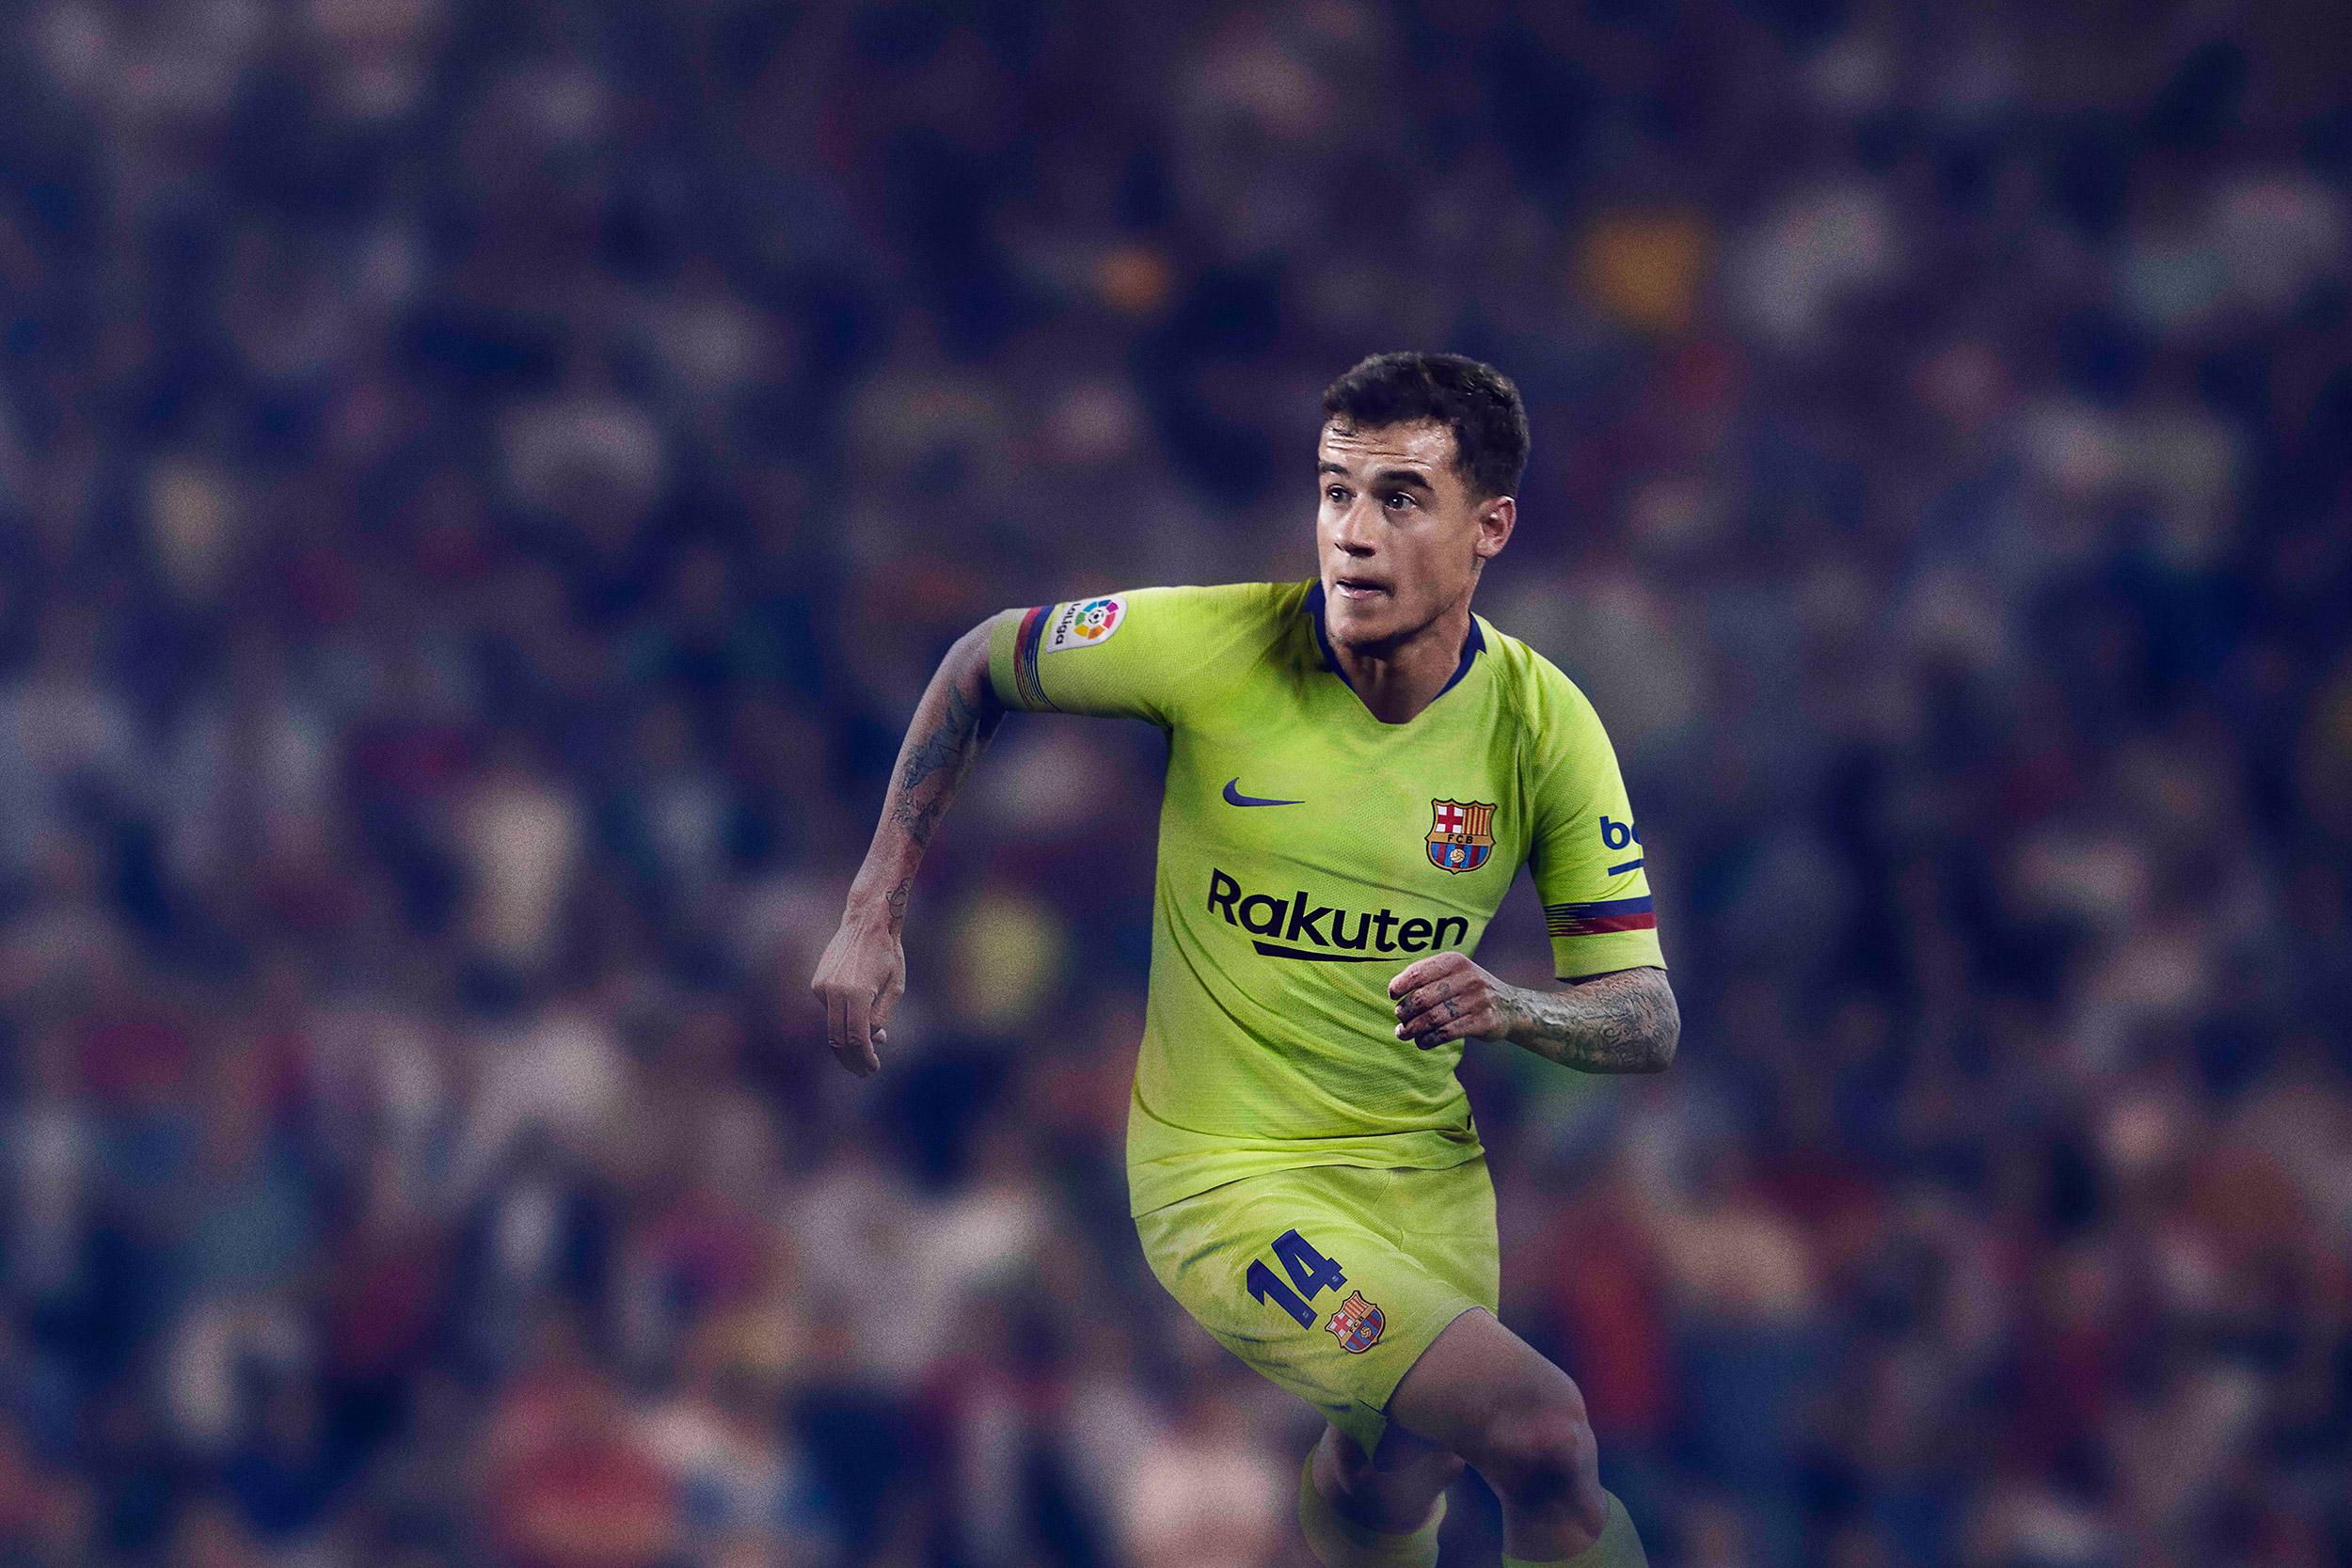 FC_Barcelona_Away_Kit_2018-19-2_80476